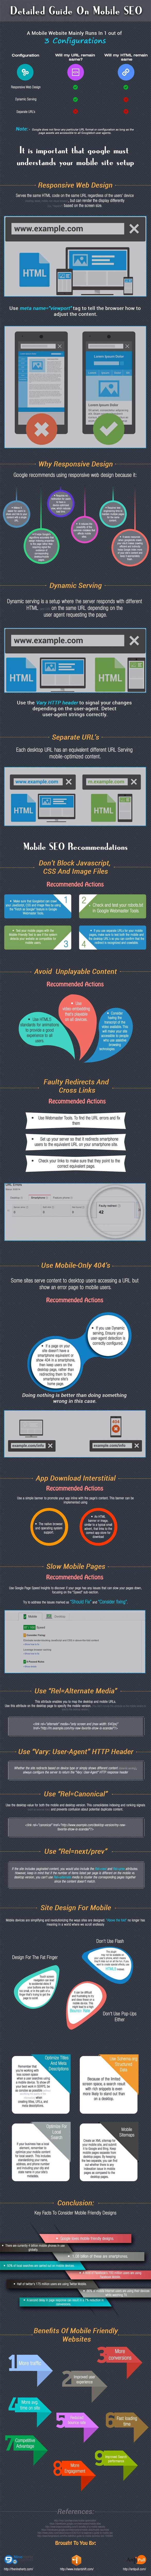 mobile-seo-infographic